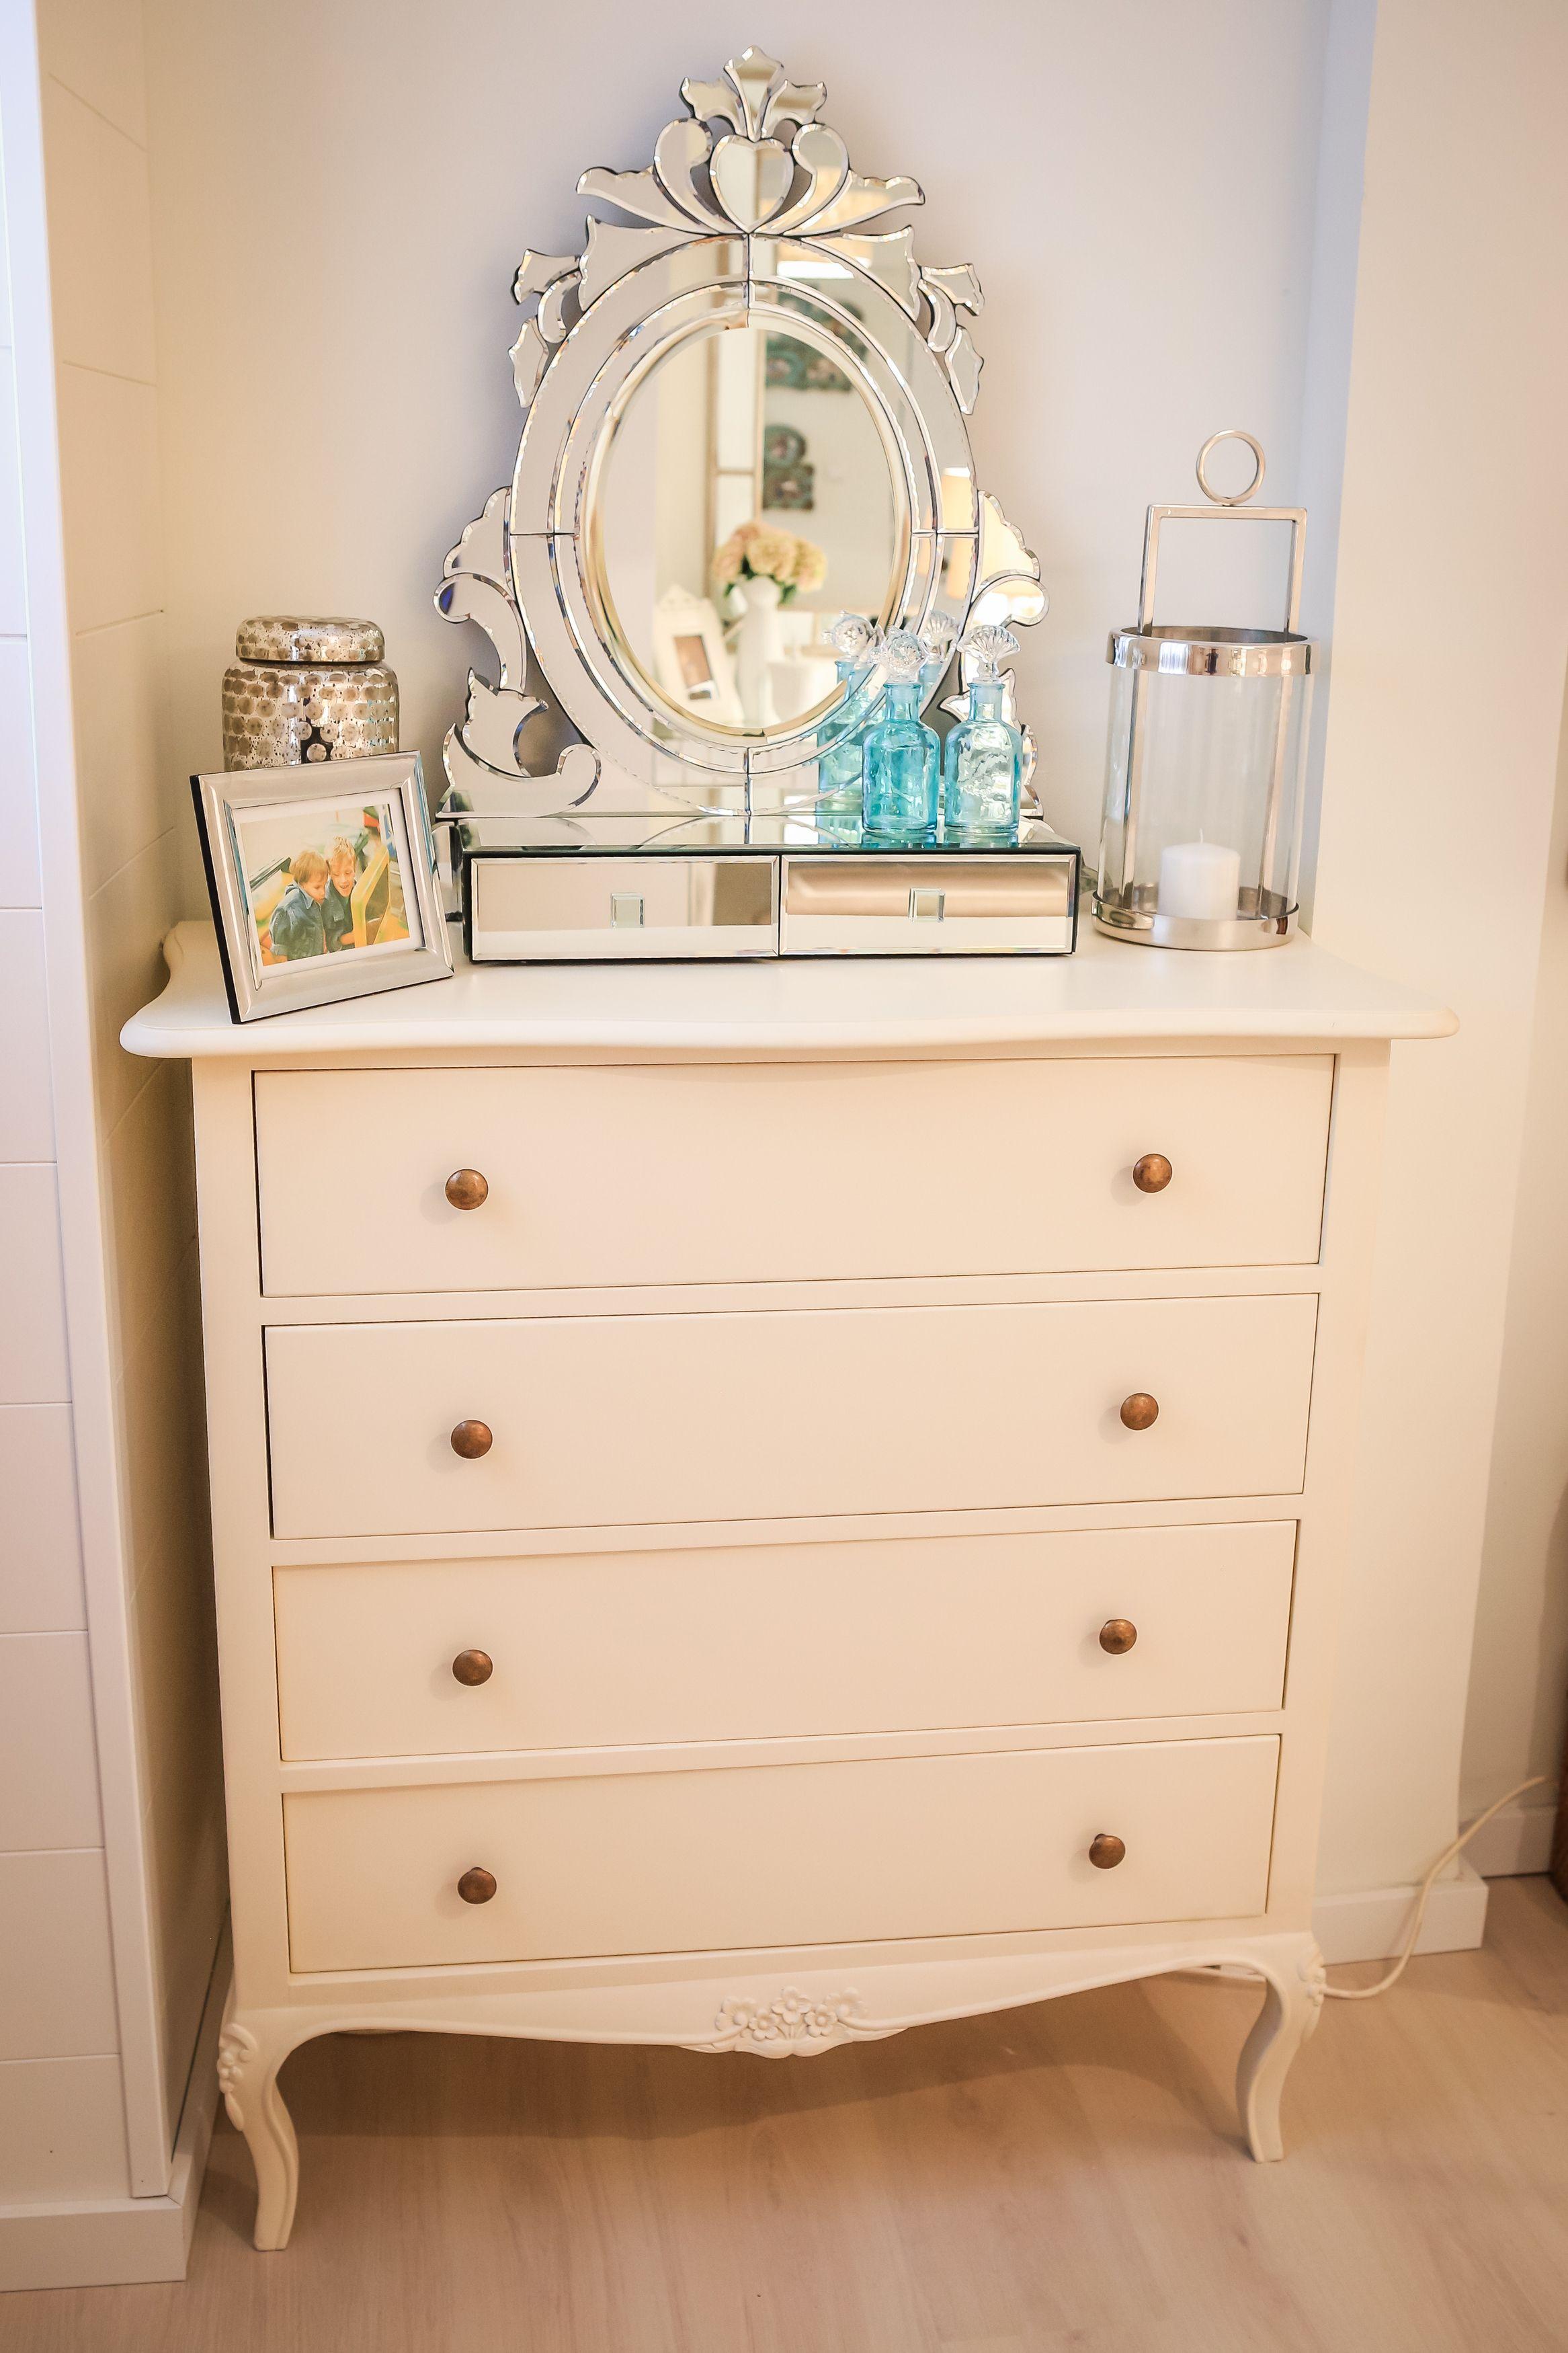 Ana Antunes | Quarto | Bedroom | Cómoda | Chest of Drawers | Espelho | Mirror | Decorative Objects | Home | Interior | Design